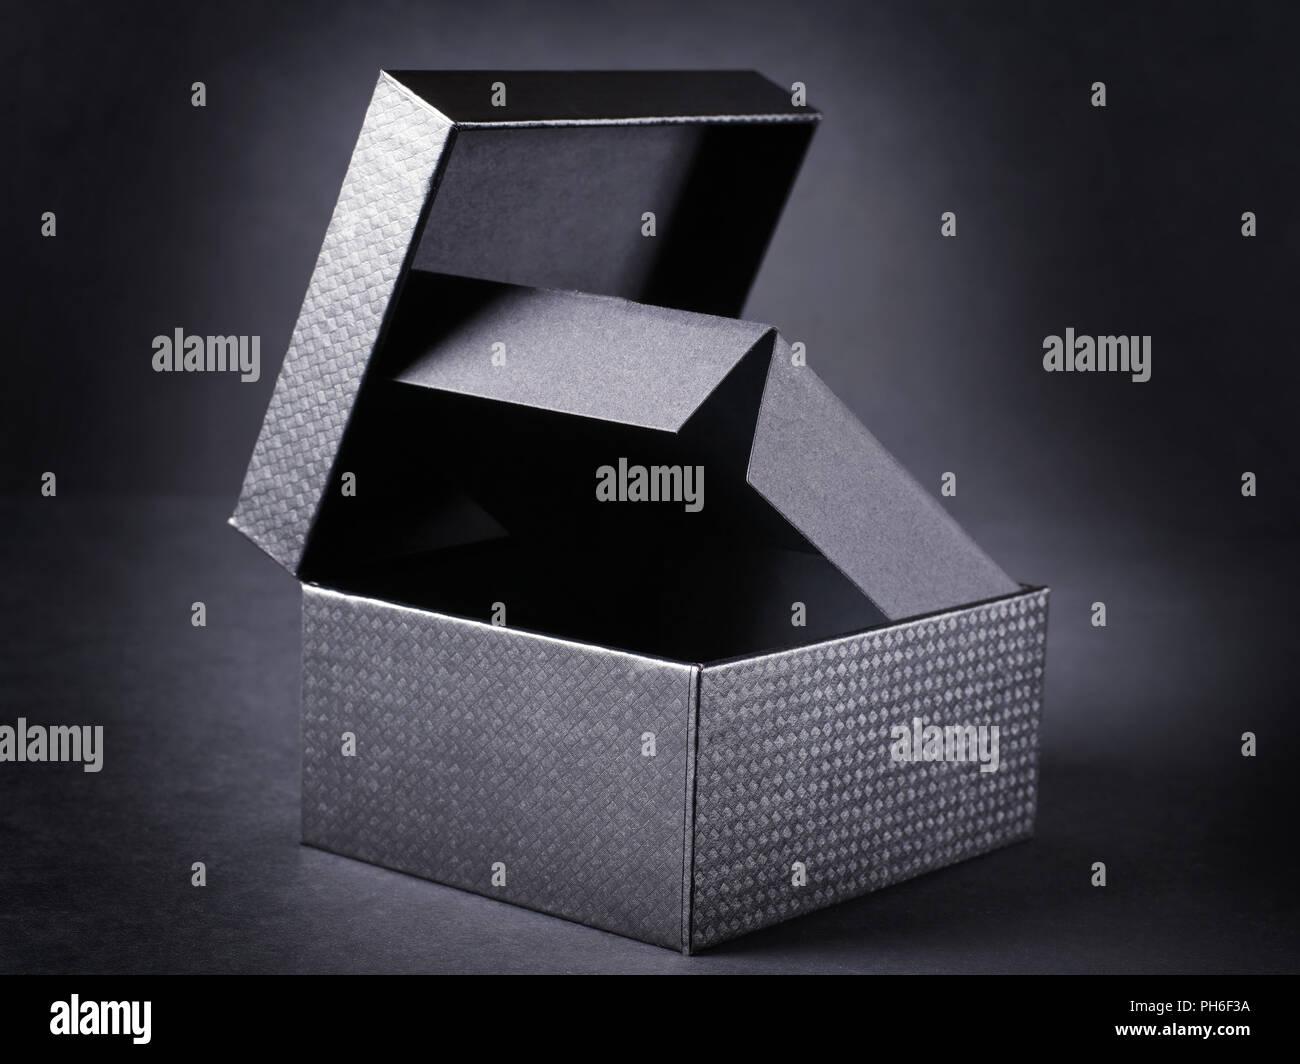 Open black box on black background. - Stock Image